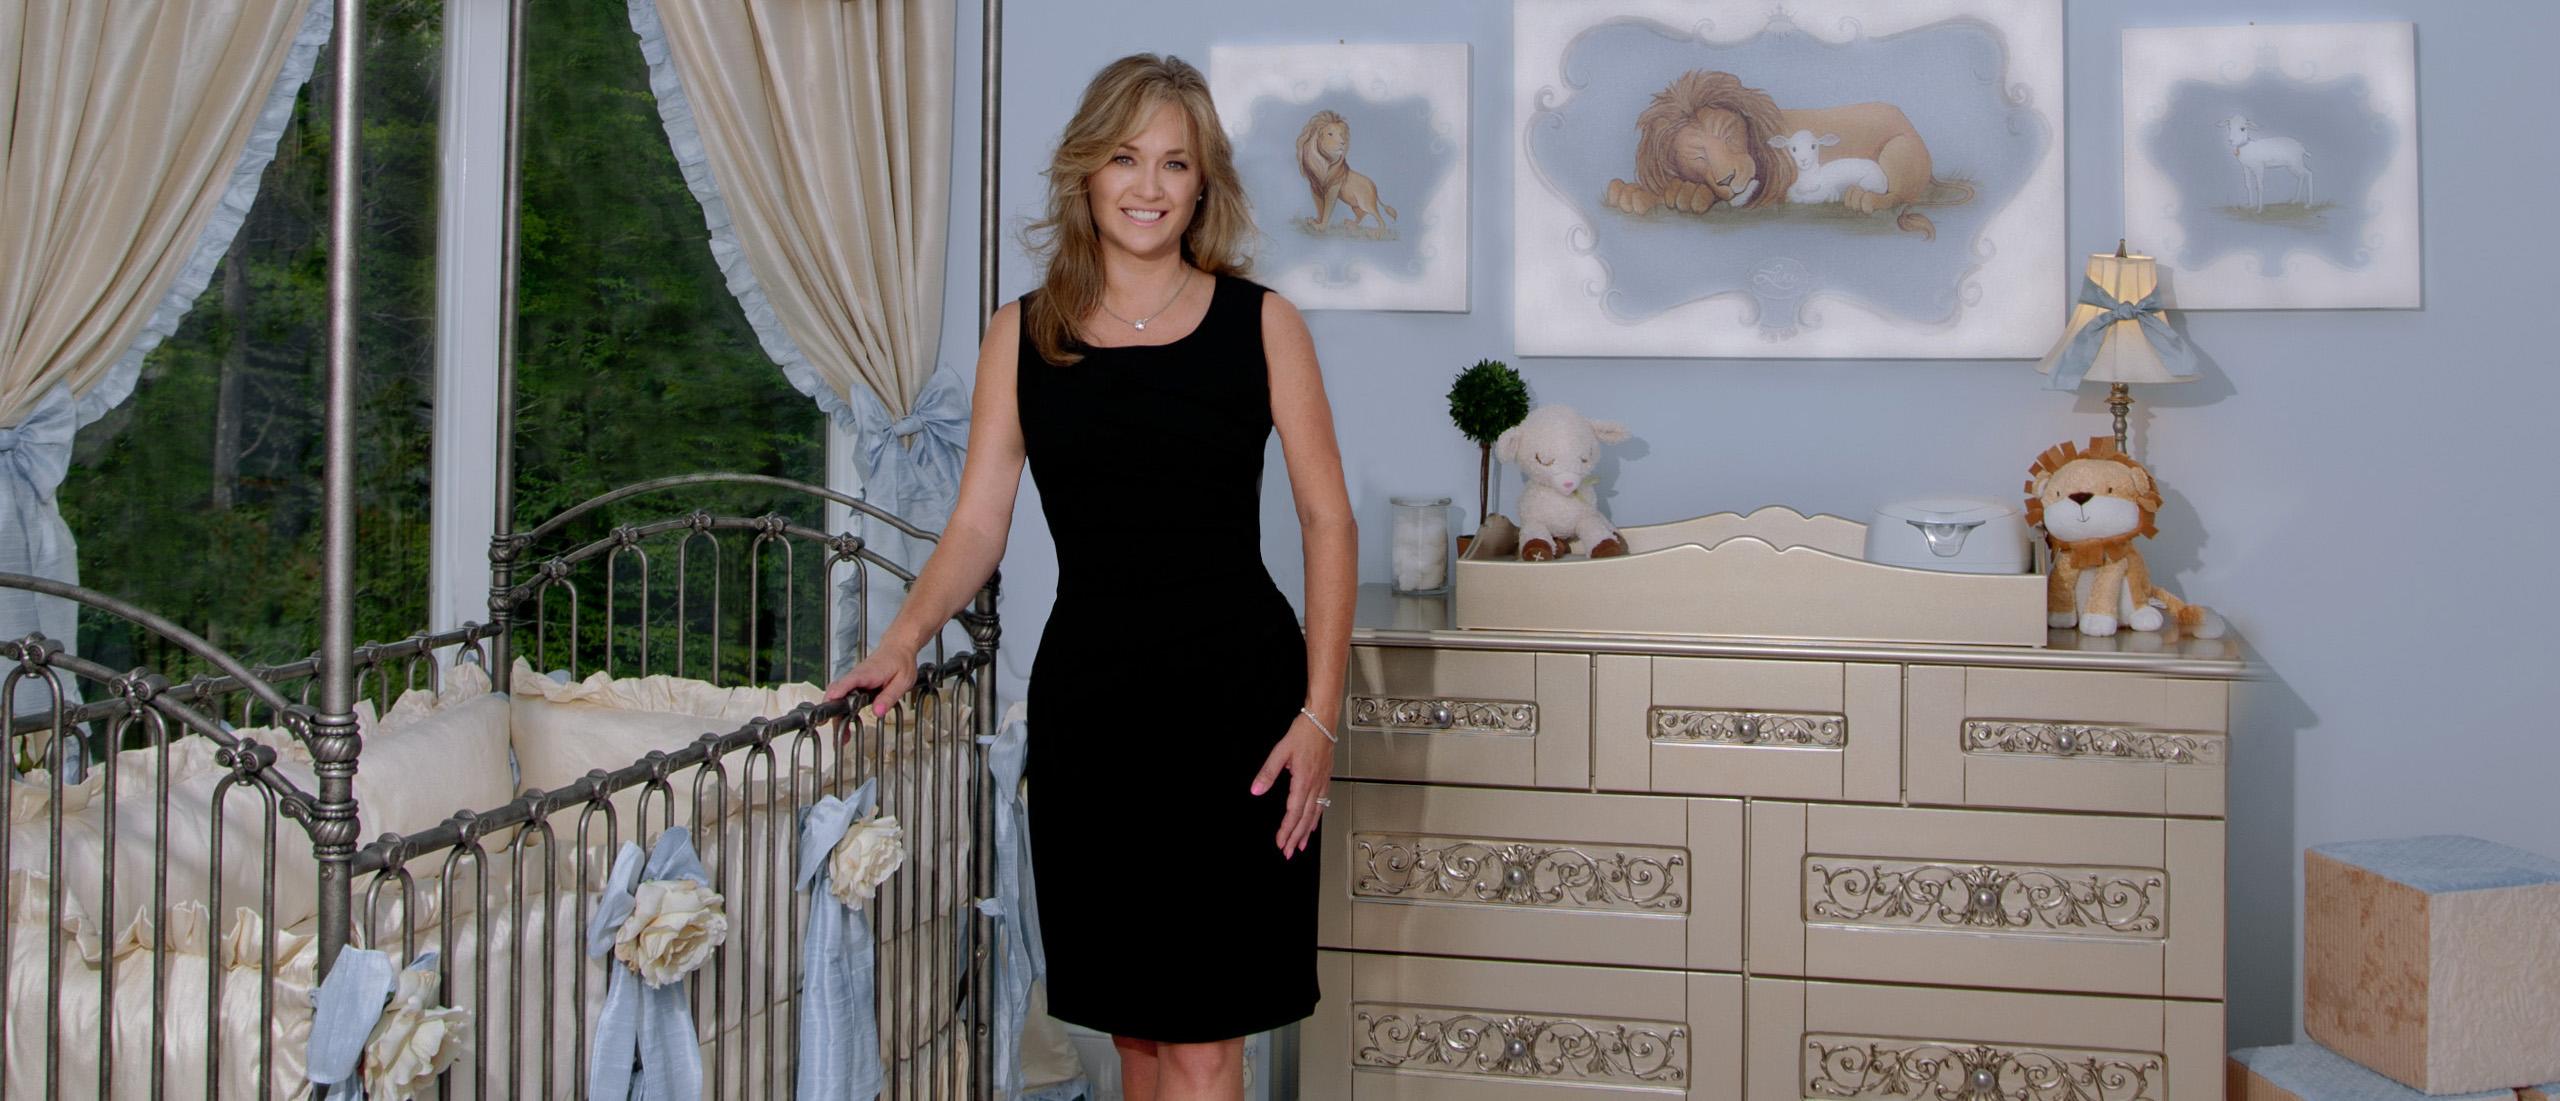 Sherri Blum, Celebrity Nursery Interior Designer